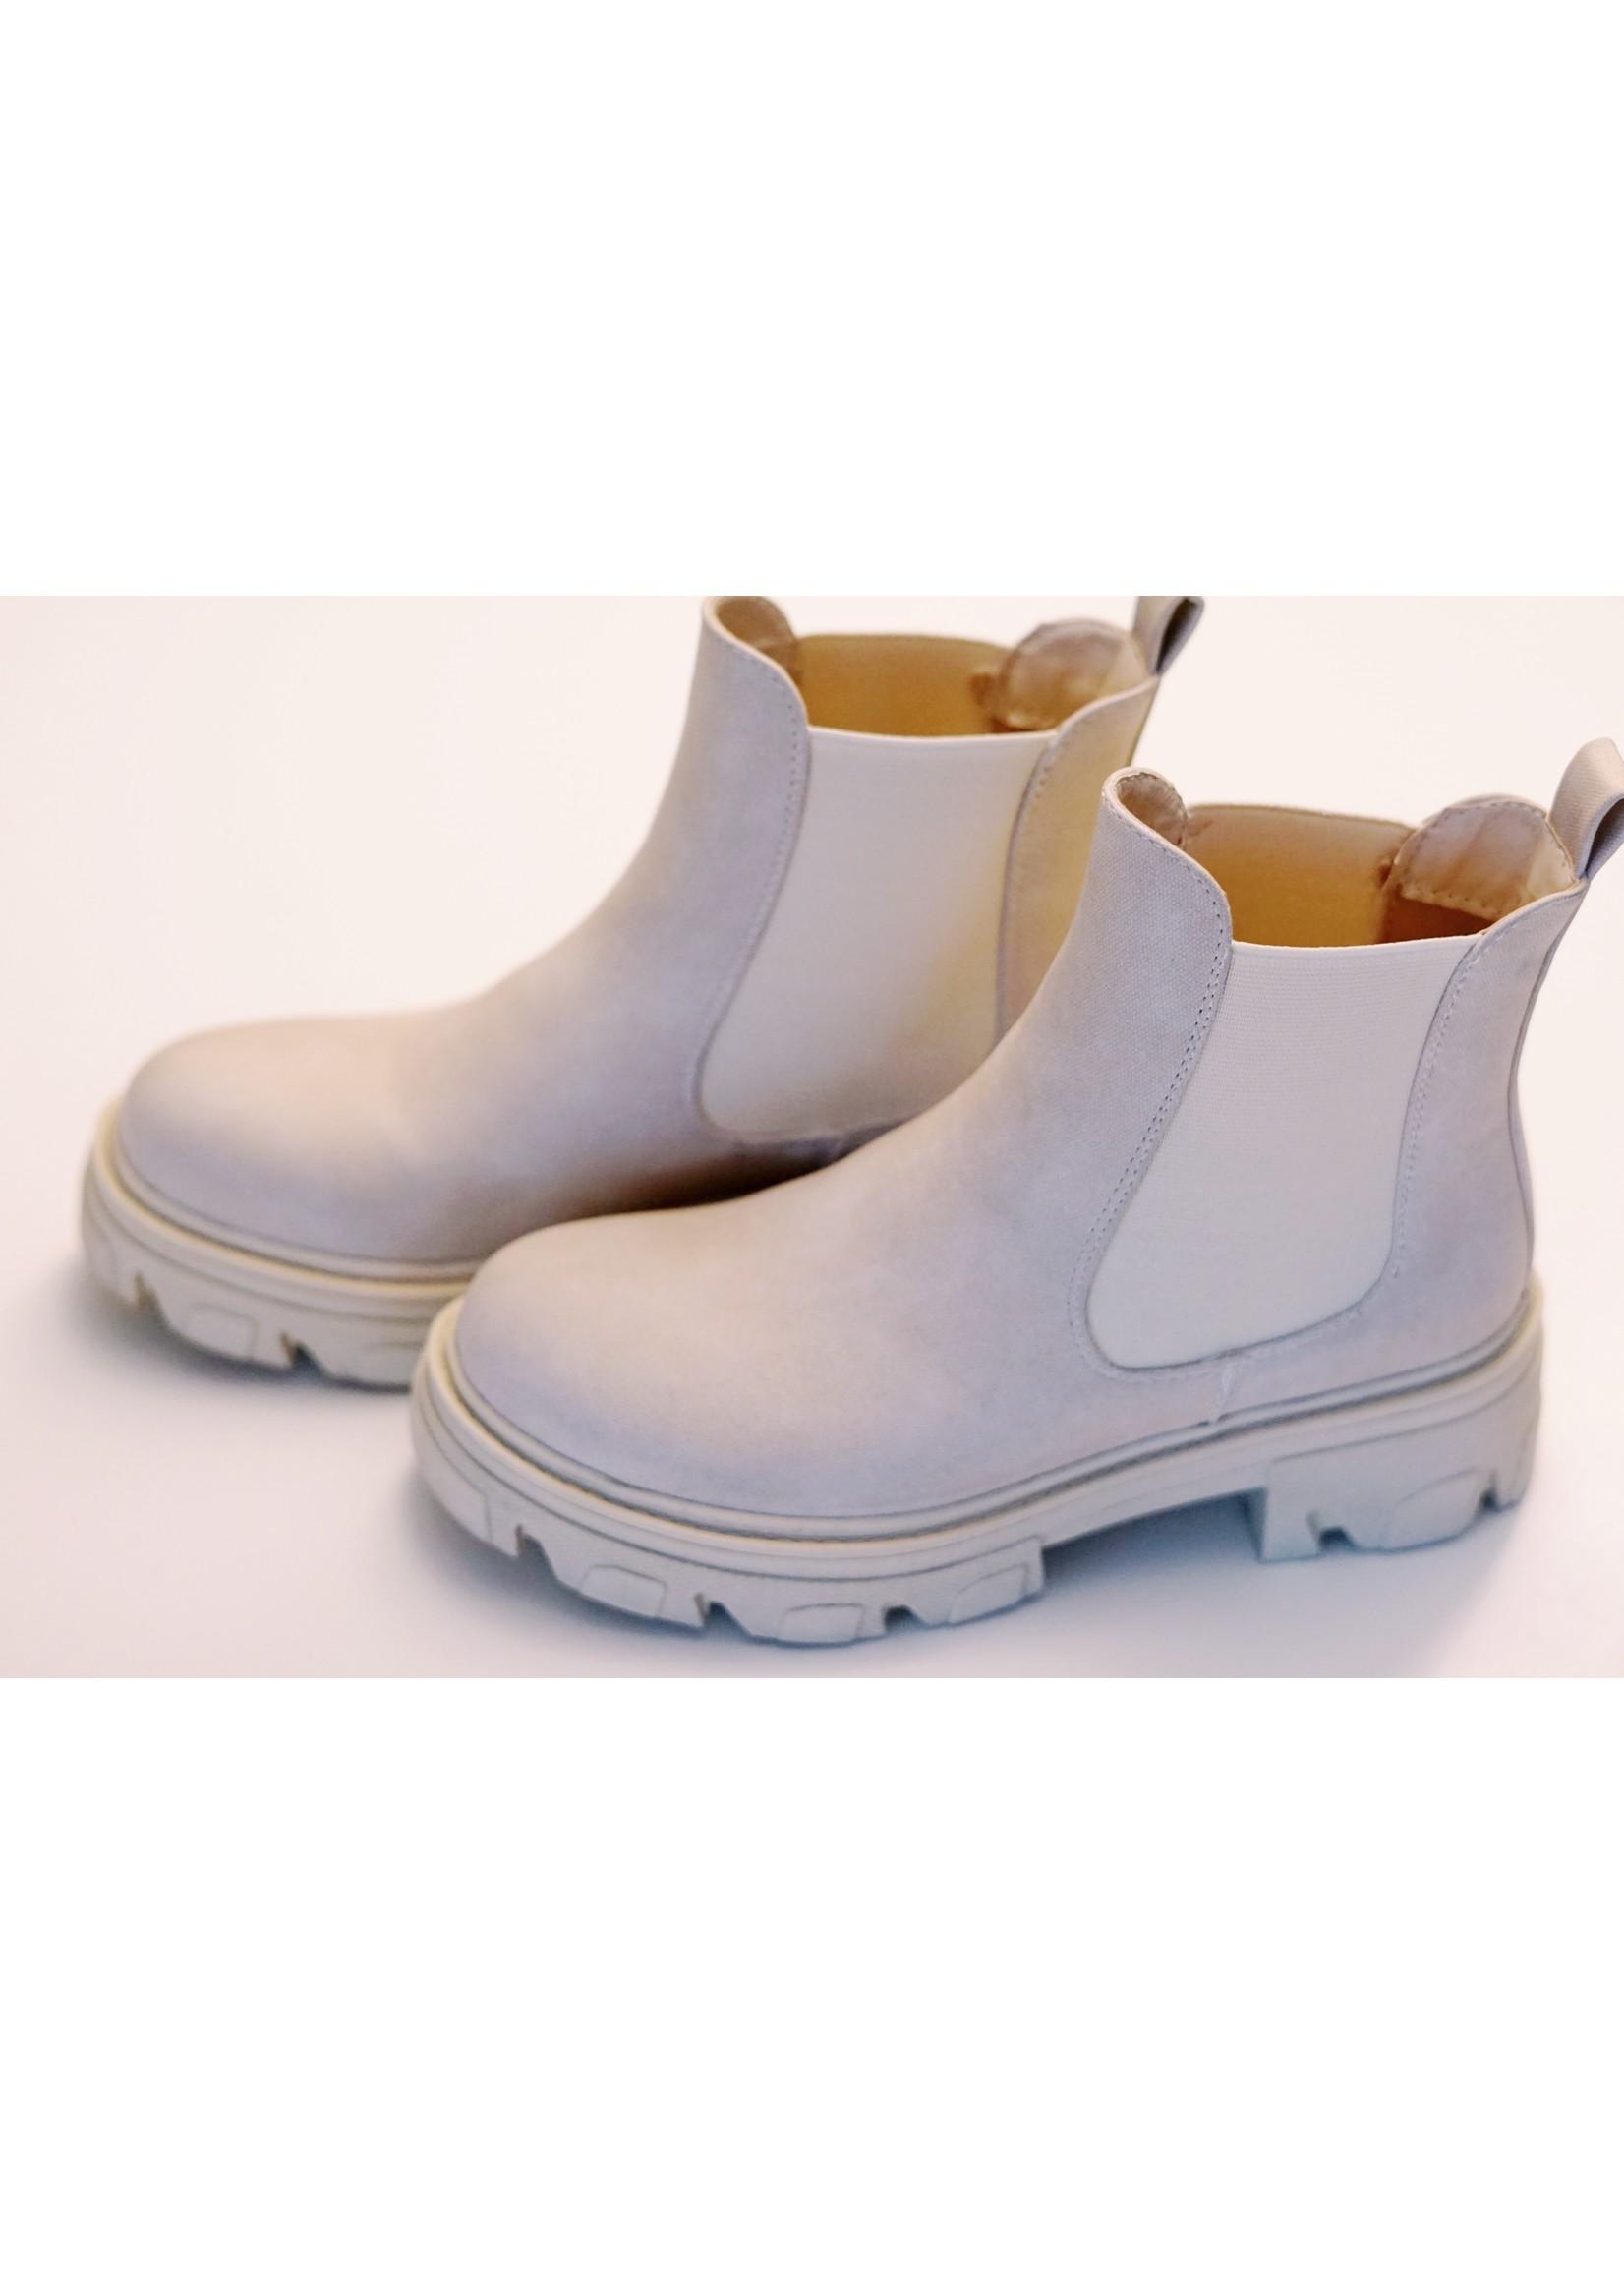 Beige spring boot